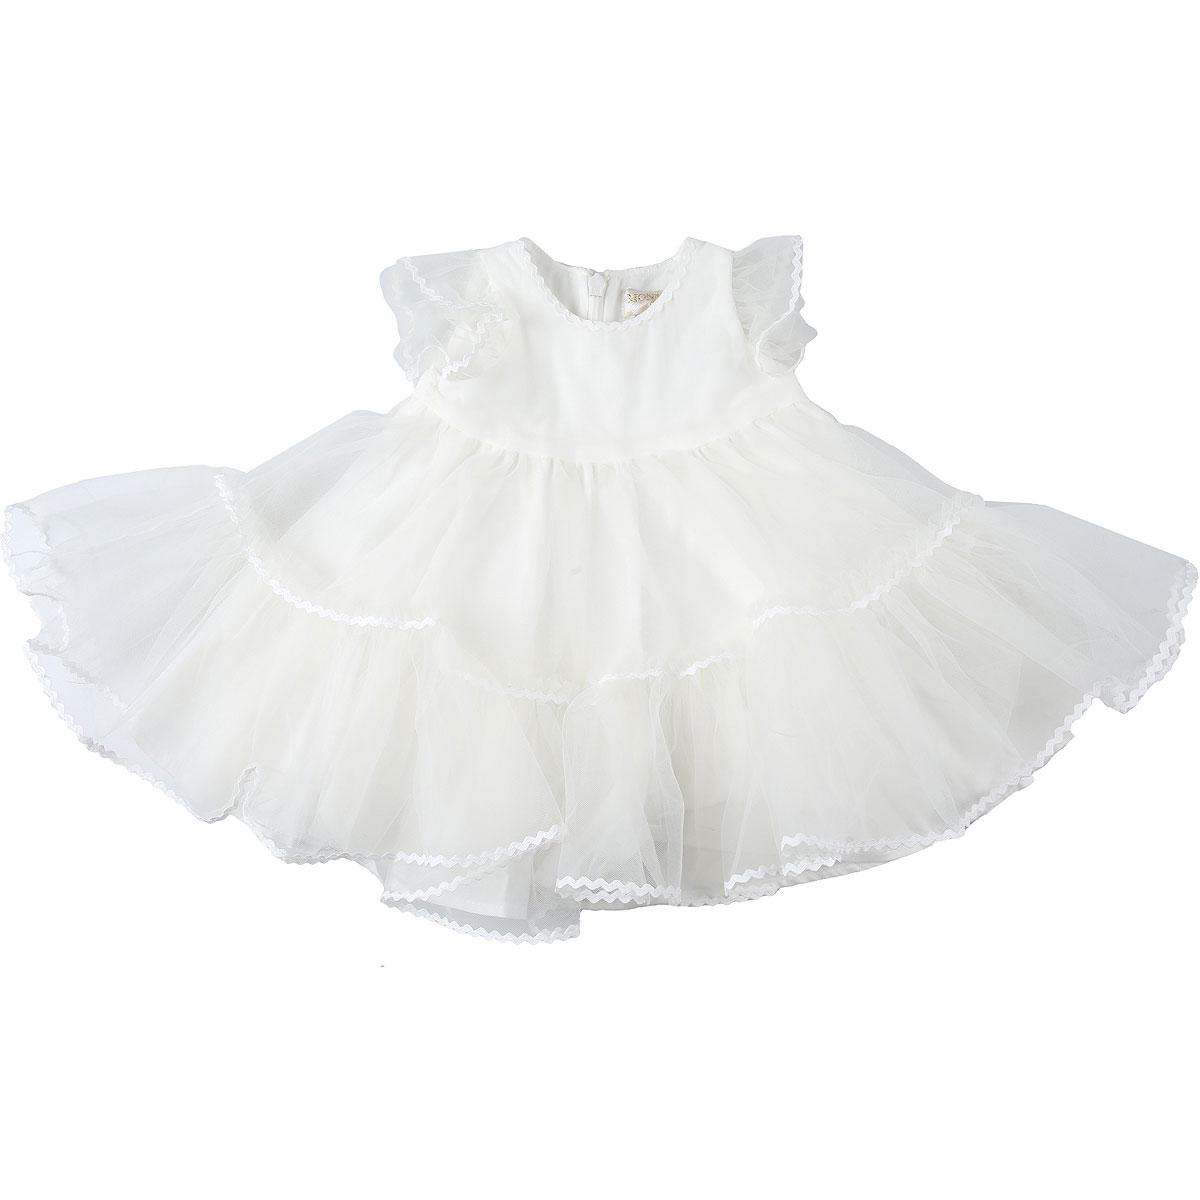 Monnalisa Baby Dress for Girls On Sale, White, polyamide, 2019, 12M 6M 9M